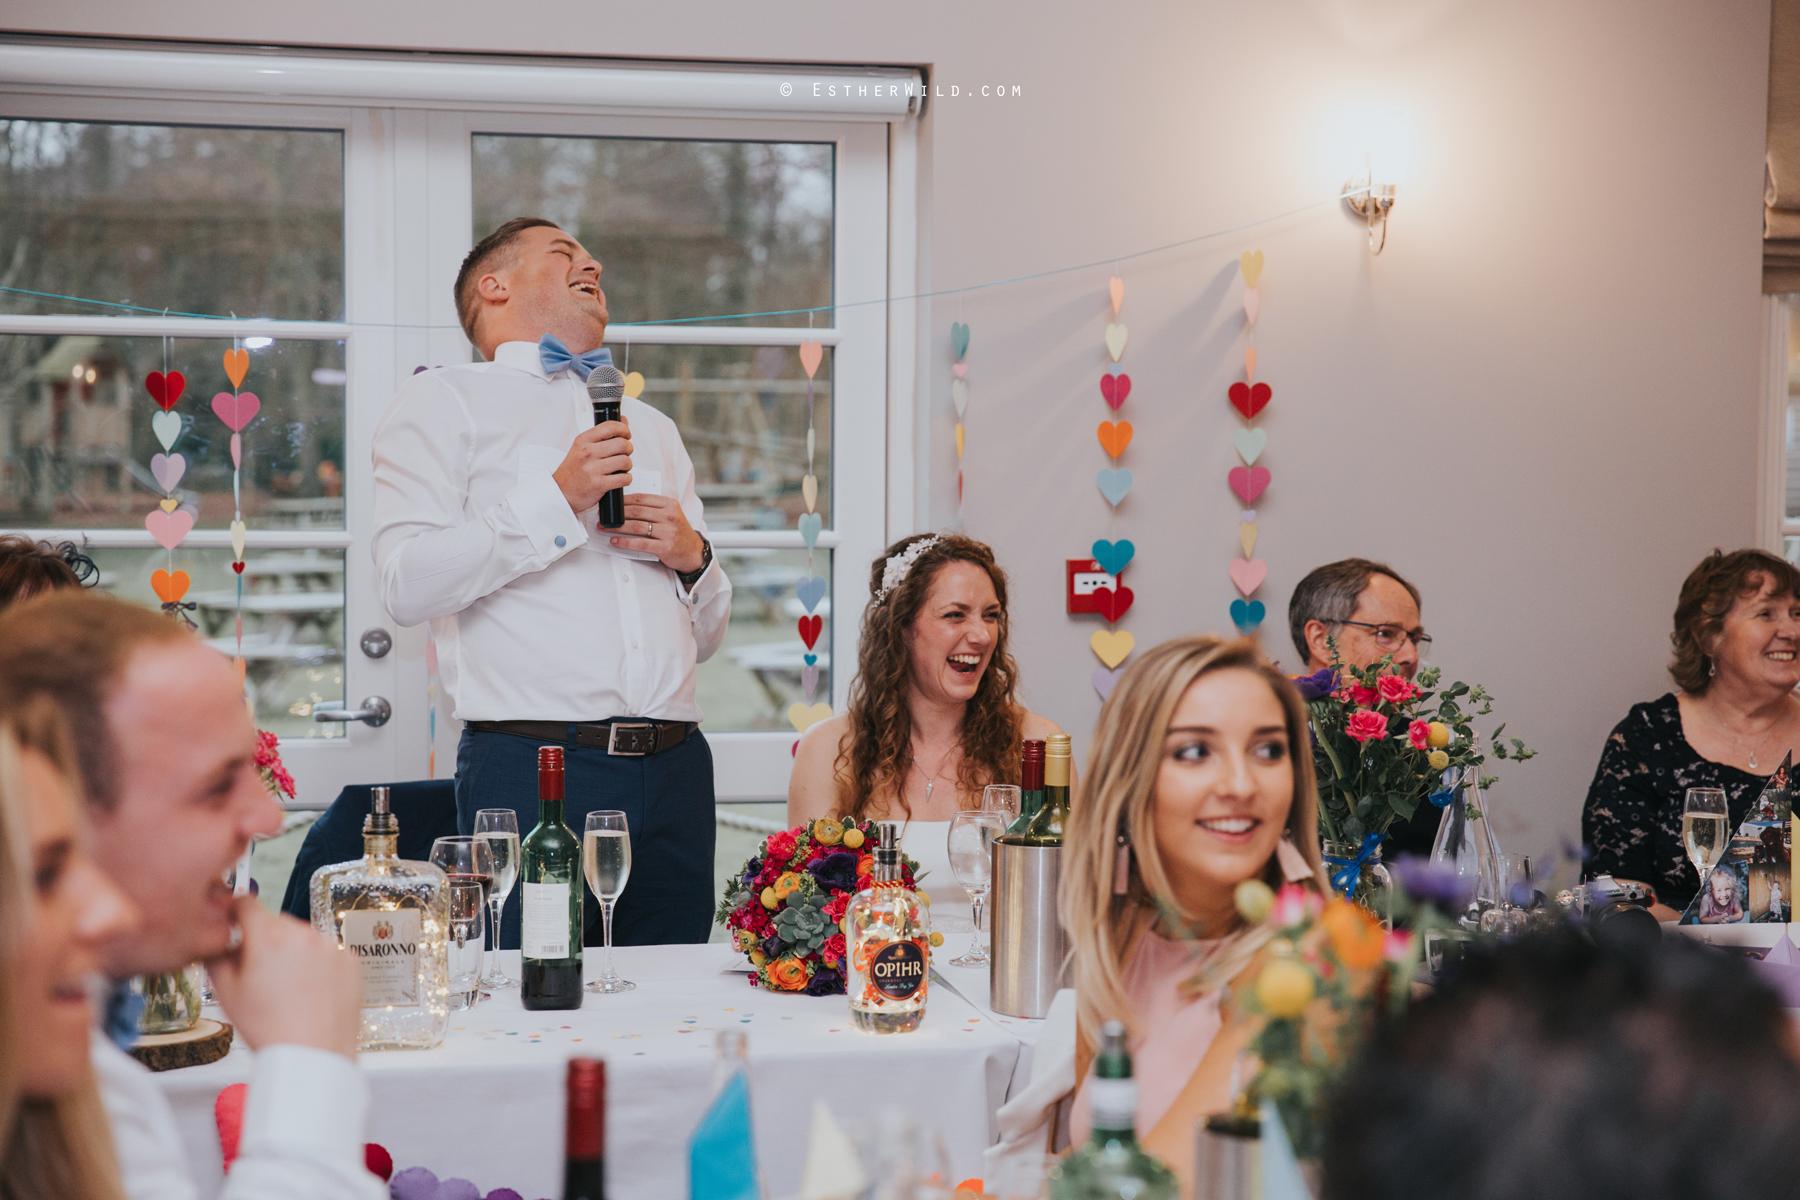 The_BoatHouse_Wedding_Venue_Ormesby_Norfolk_Broads_Boat_Wedding_Photography_Esther_Wild_Photographer_IMG_3130.jpg